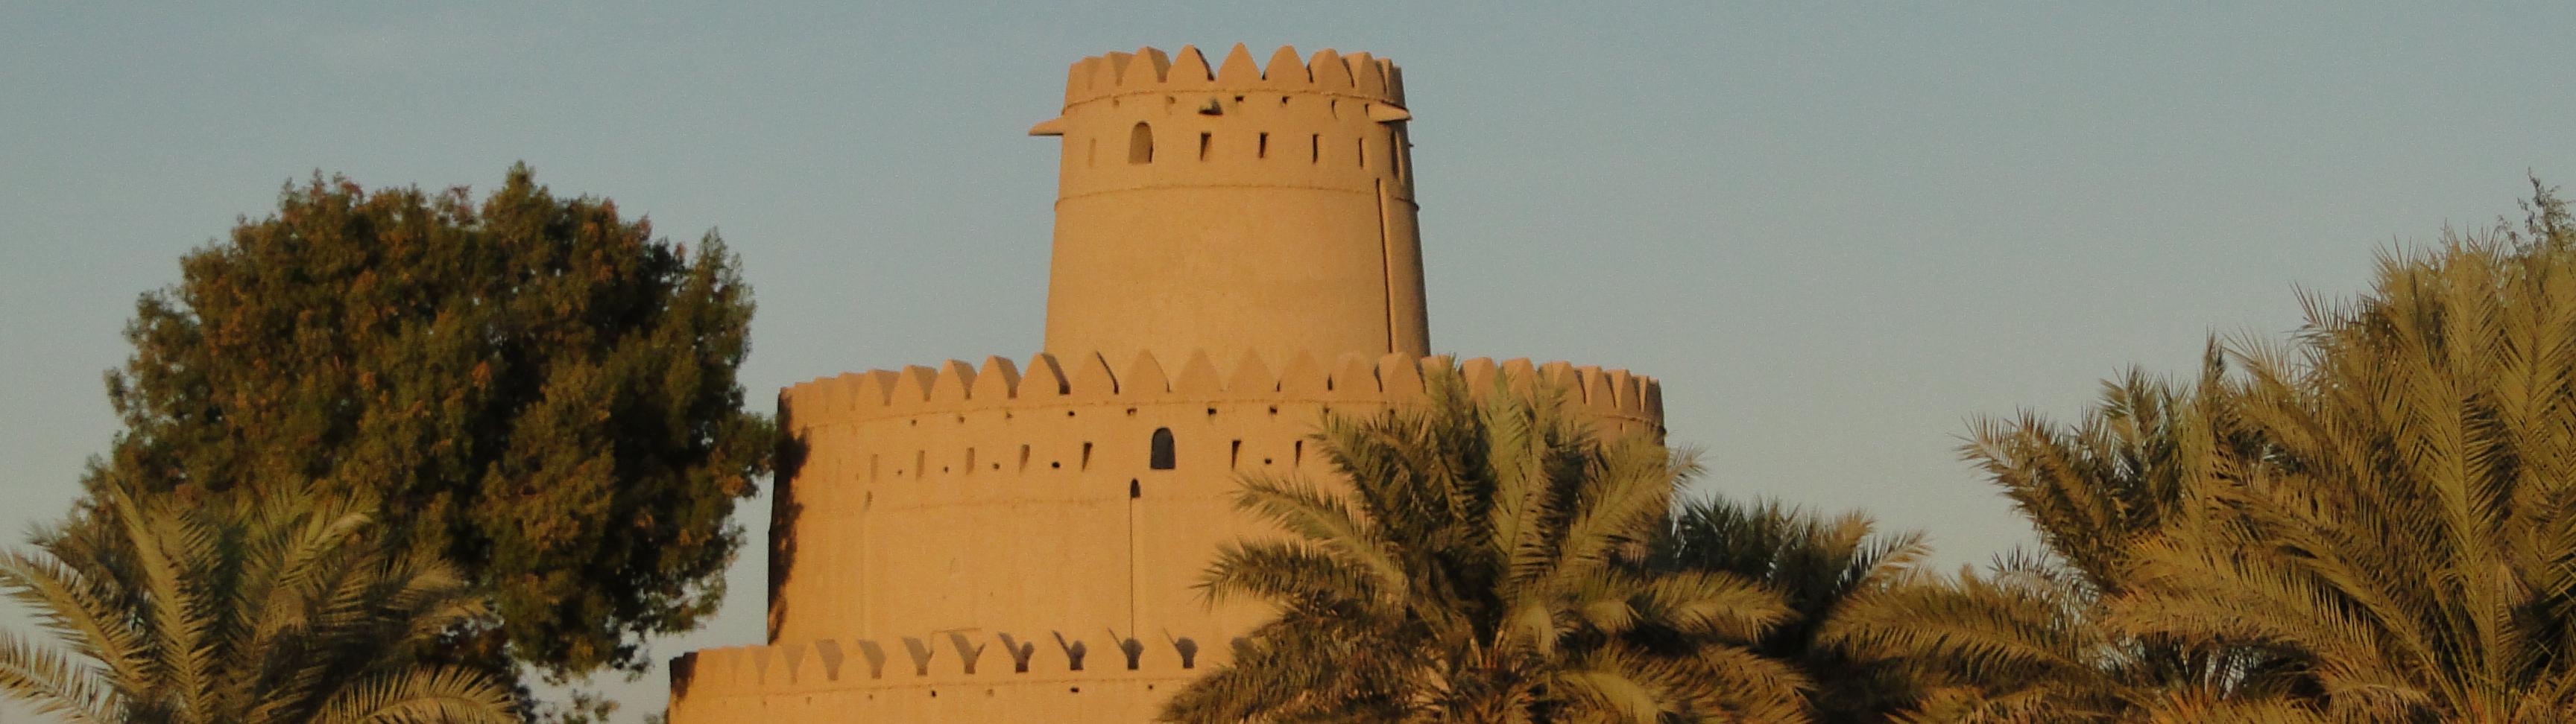 Bubaj - výlety - Al Ain